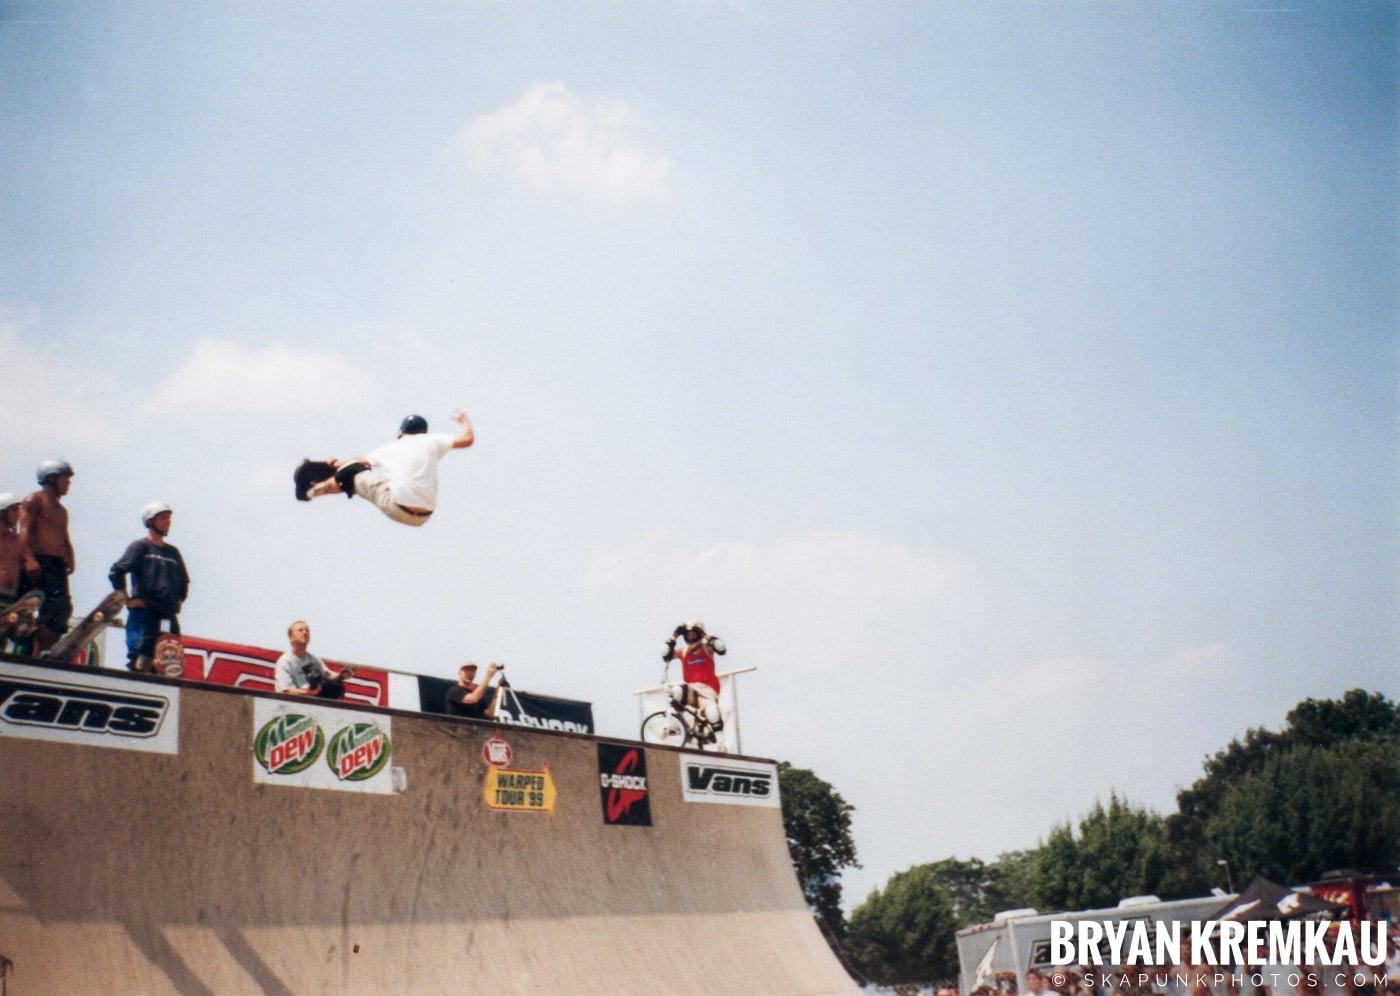 Skaters @ Vans Warped Tour, Randall's Island, NYC - 7.16.99 (15)